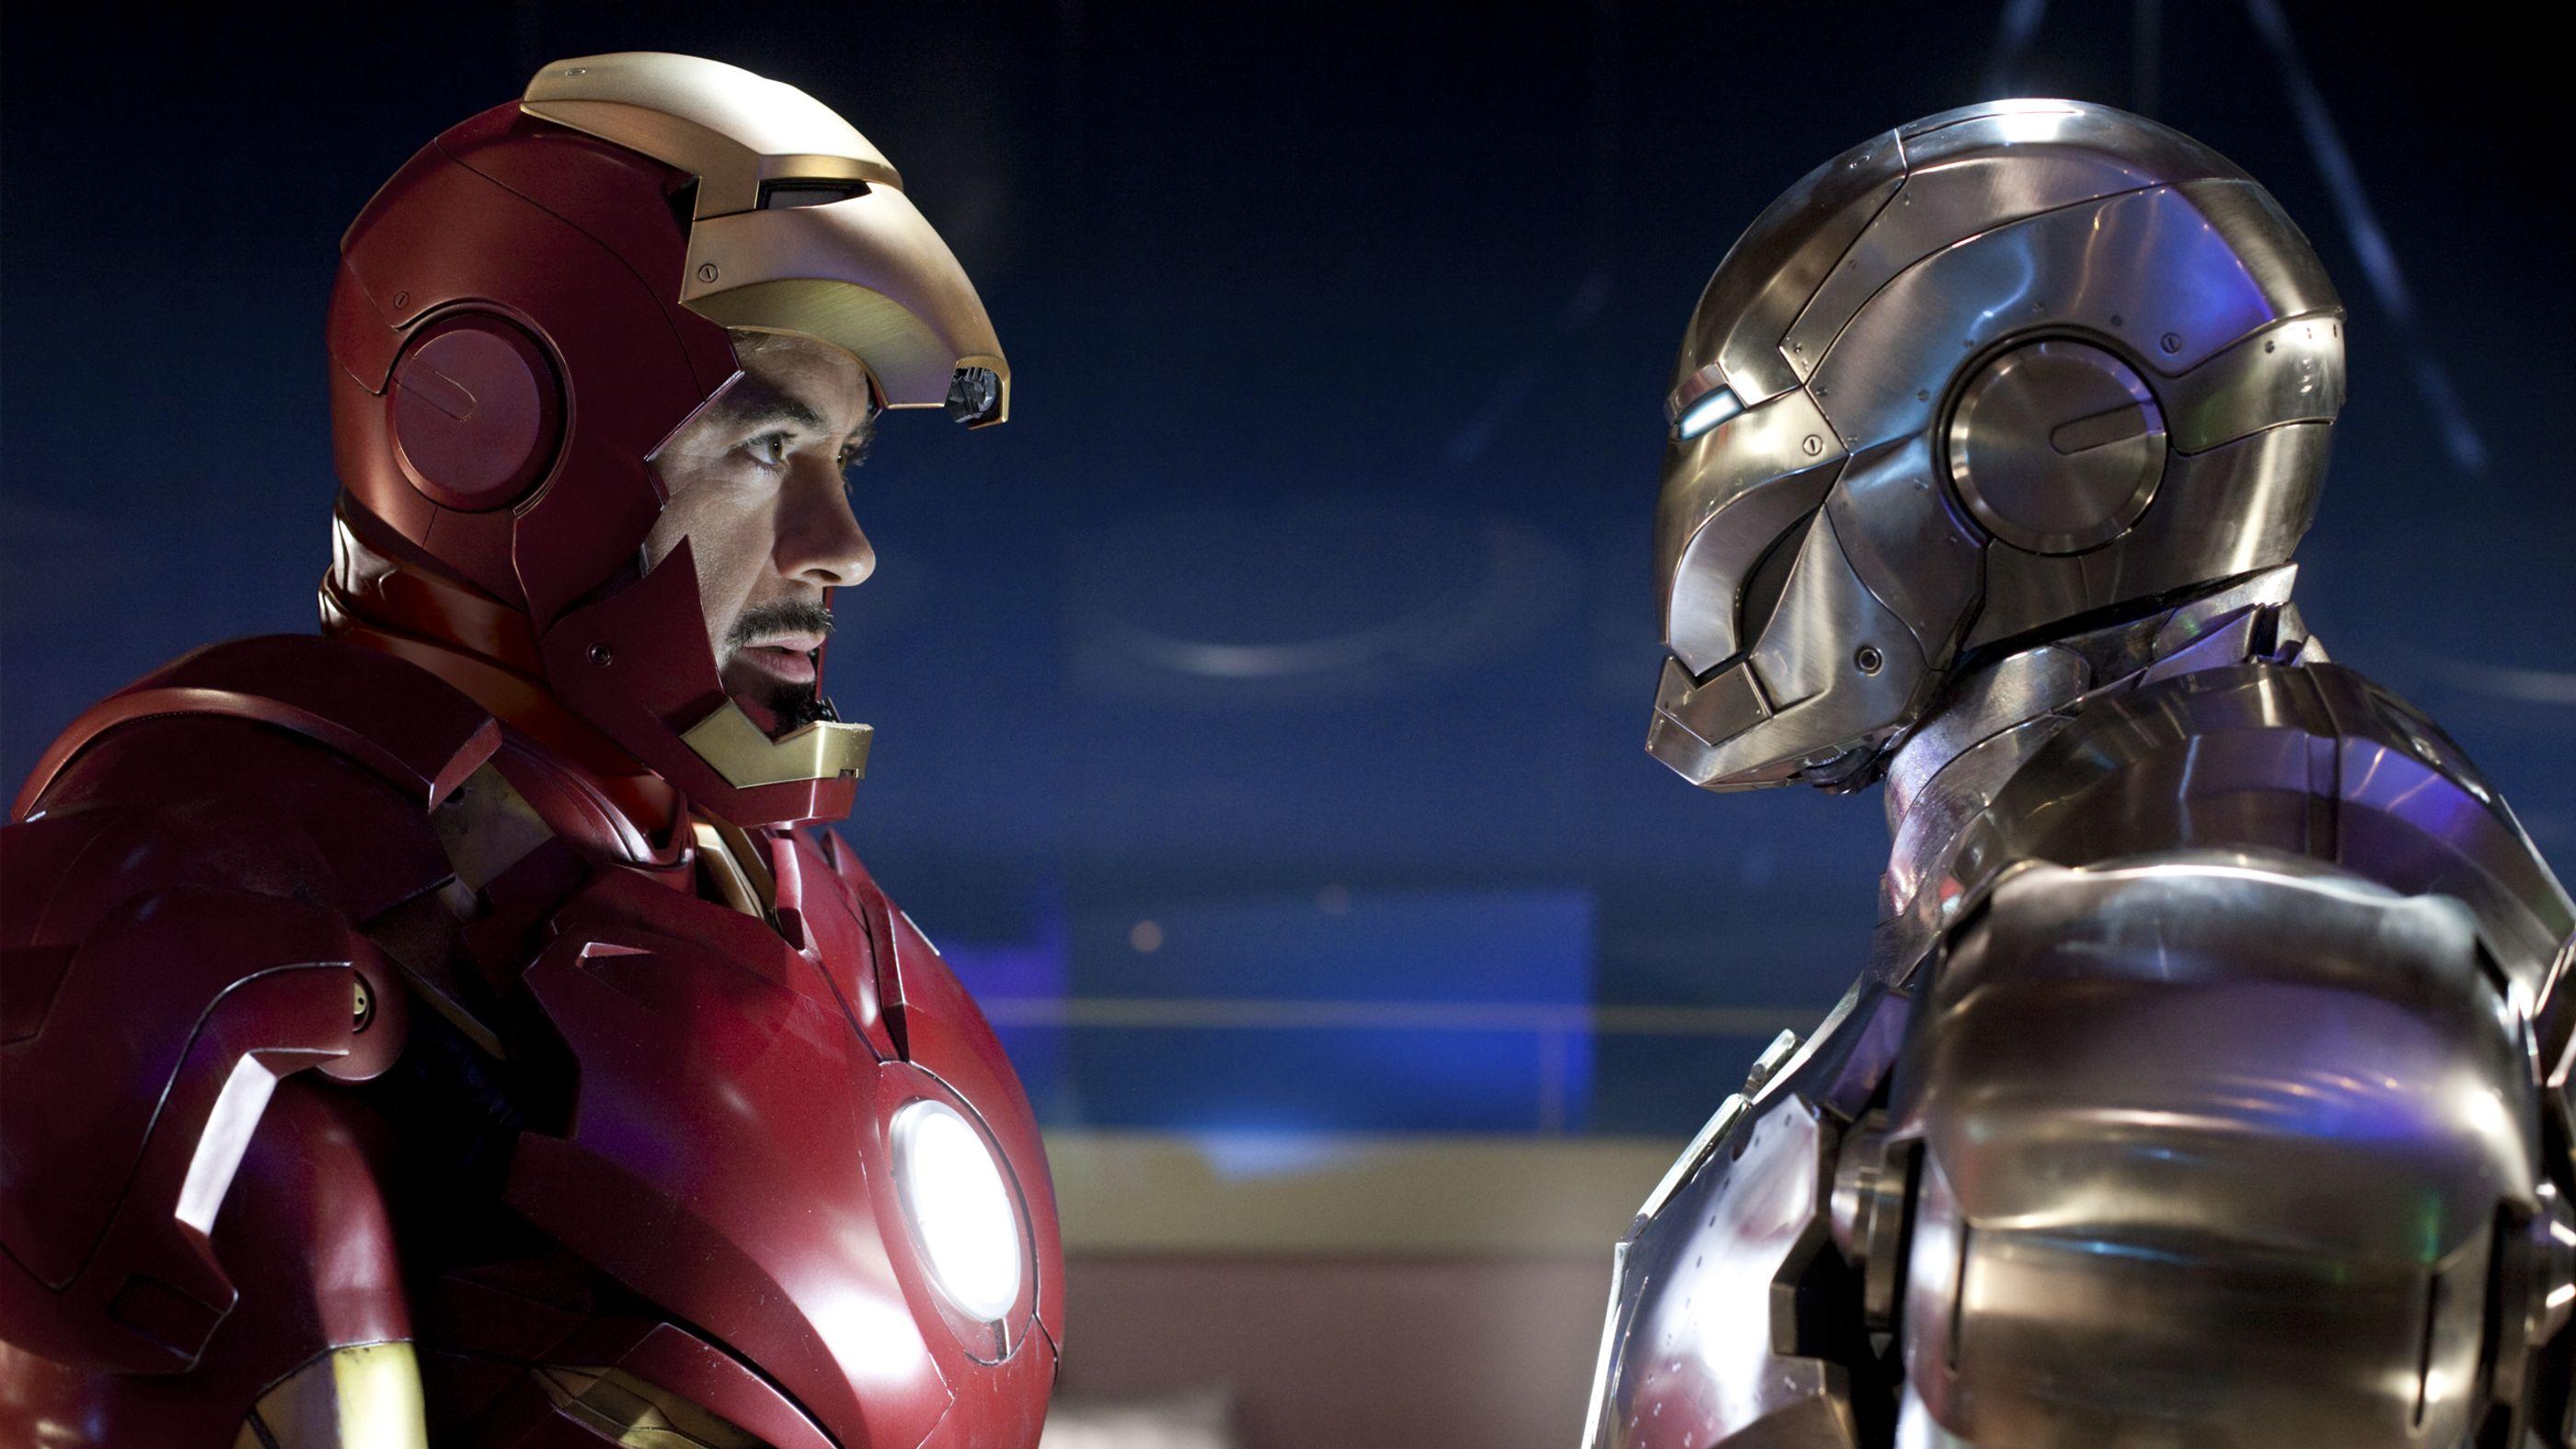 watch iron man 2 full movie online free no download